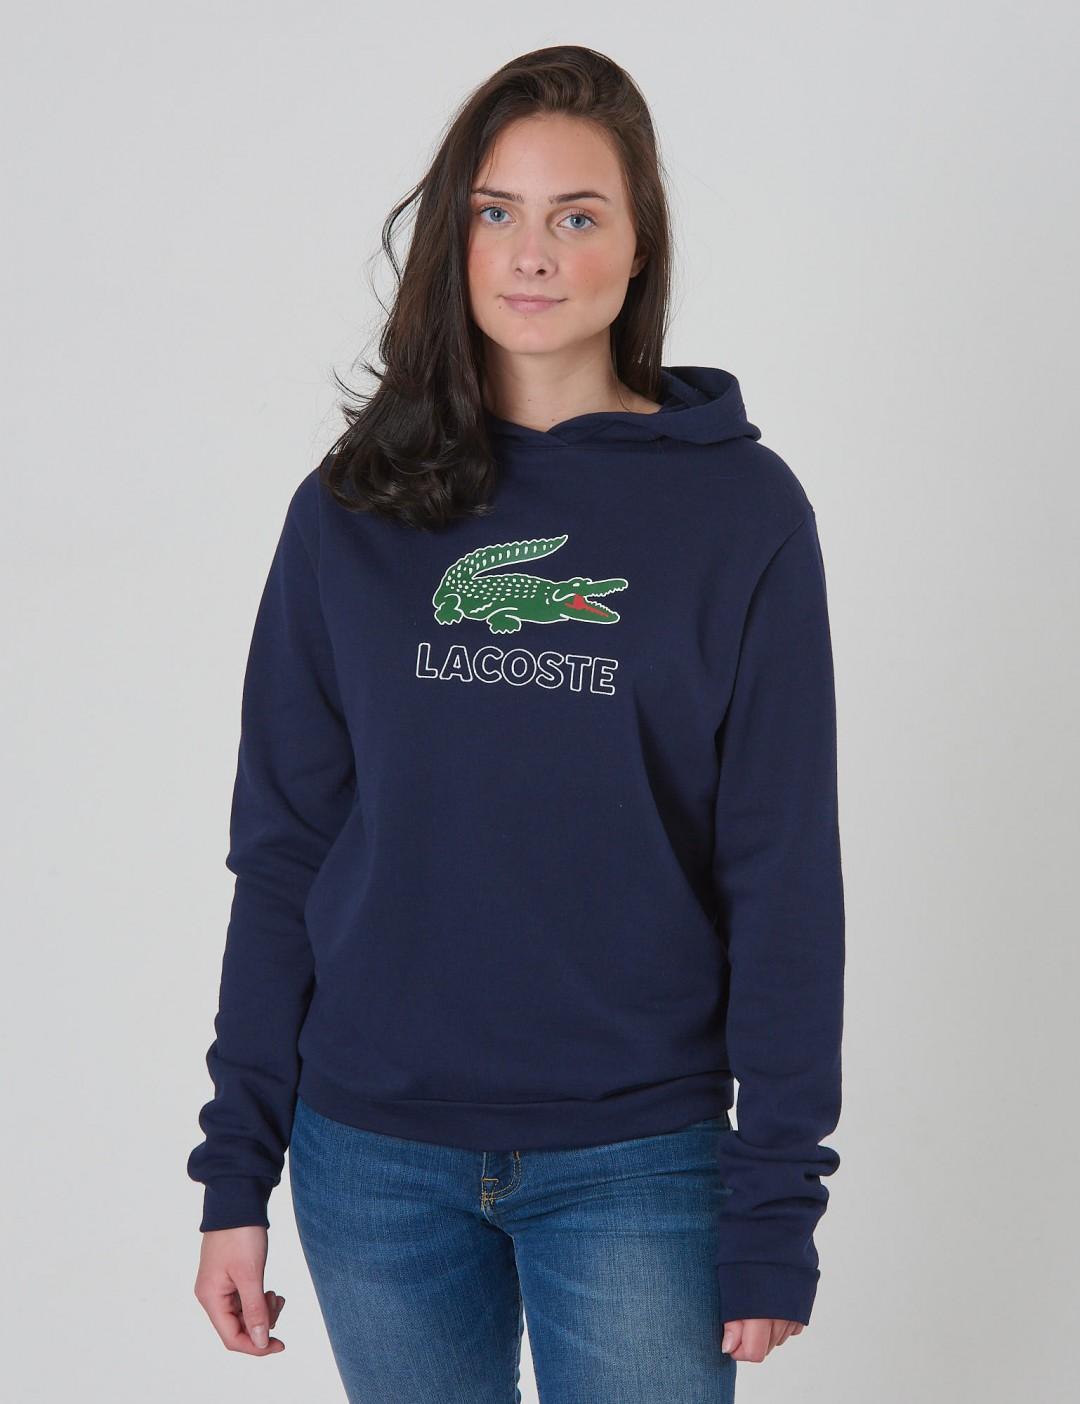 4673ec36475 Om Sweatshirt - Blå från Lacoste   KidsBrandStore